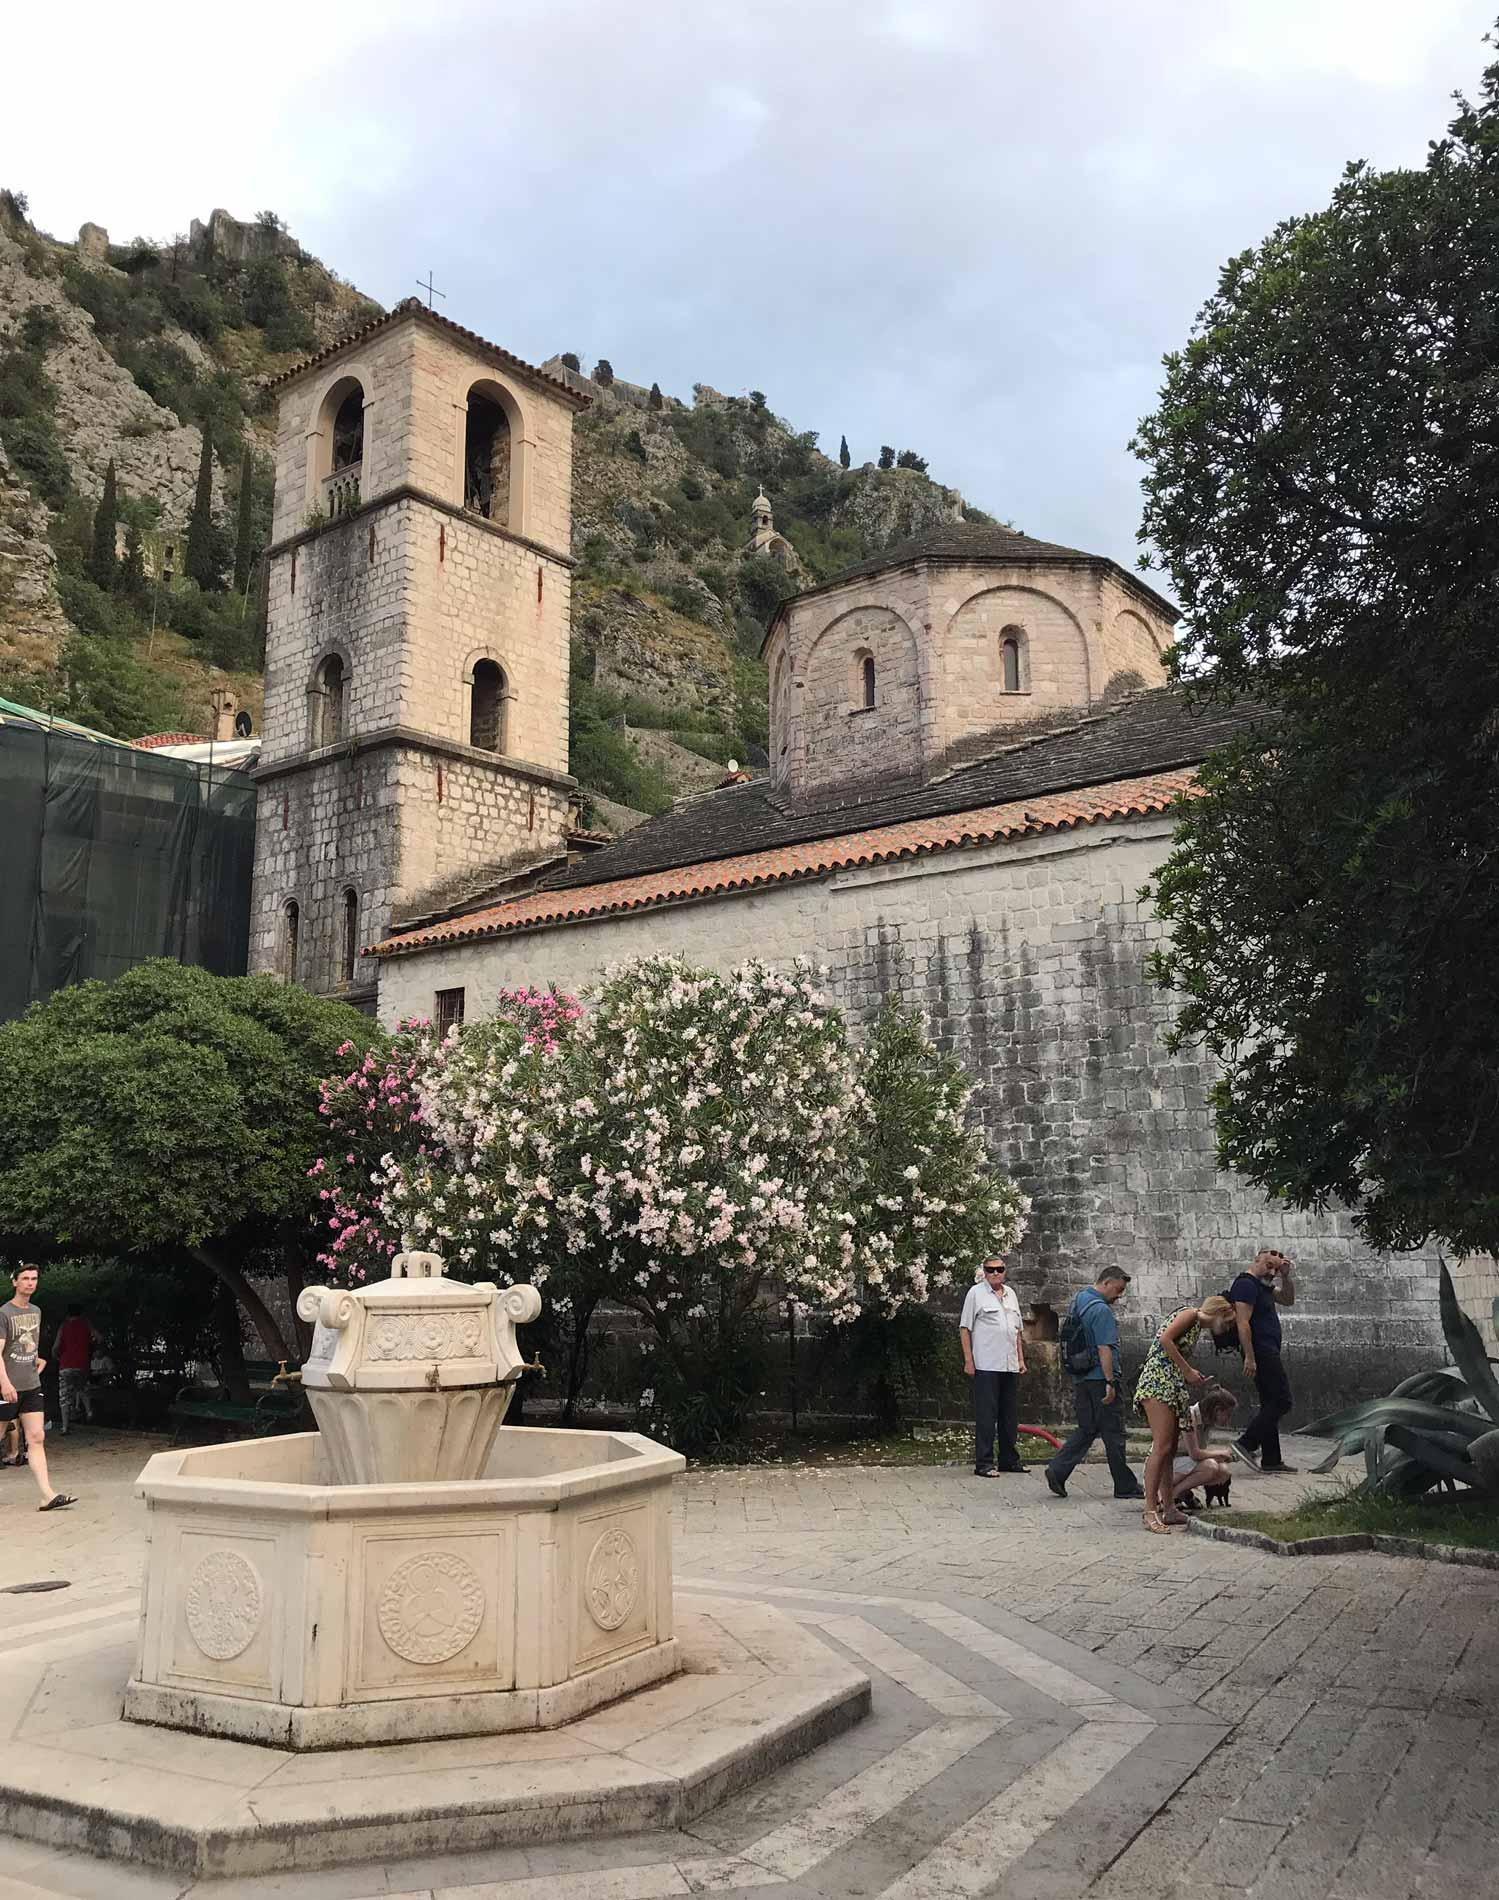 Kotor-Montenegro-Collegiata-di-Santa-Maria-Pjaca-Od-Drva-oleandri-campanile